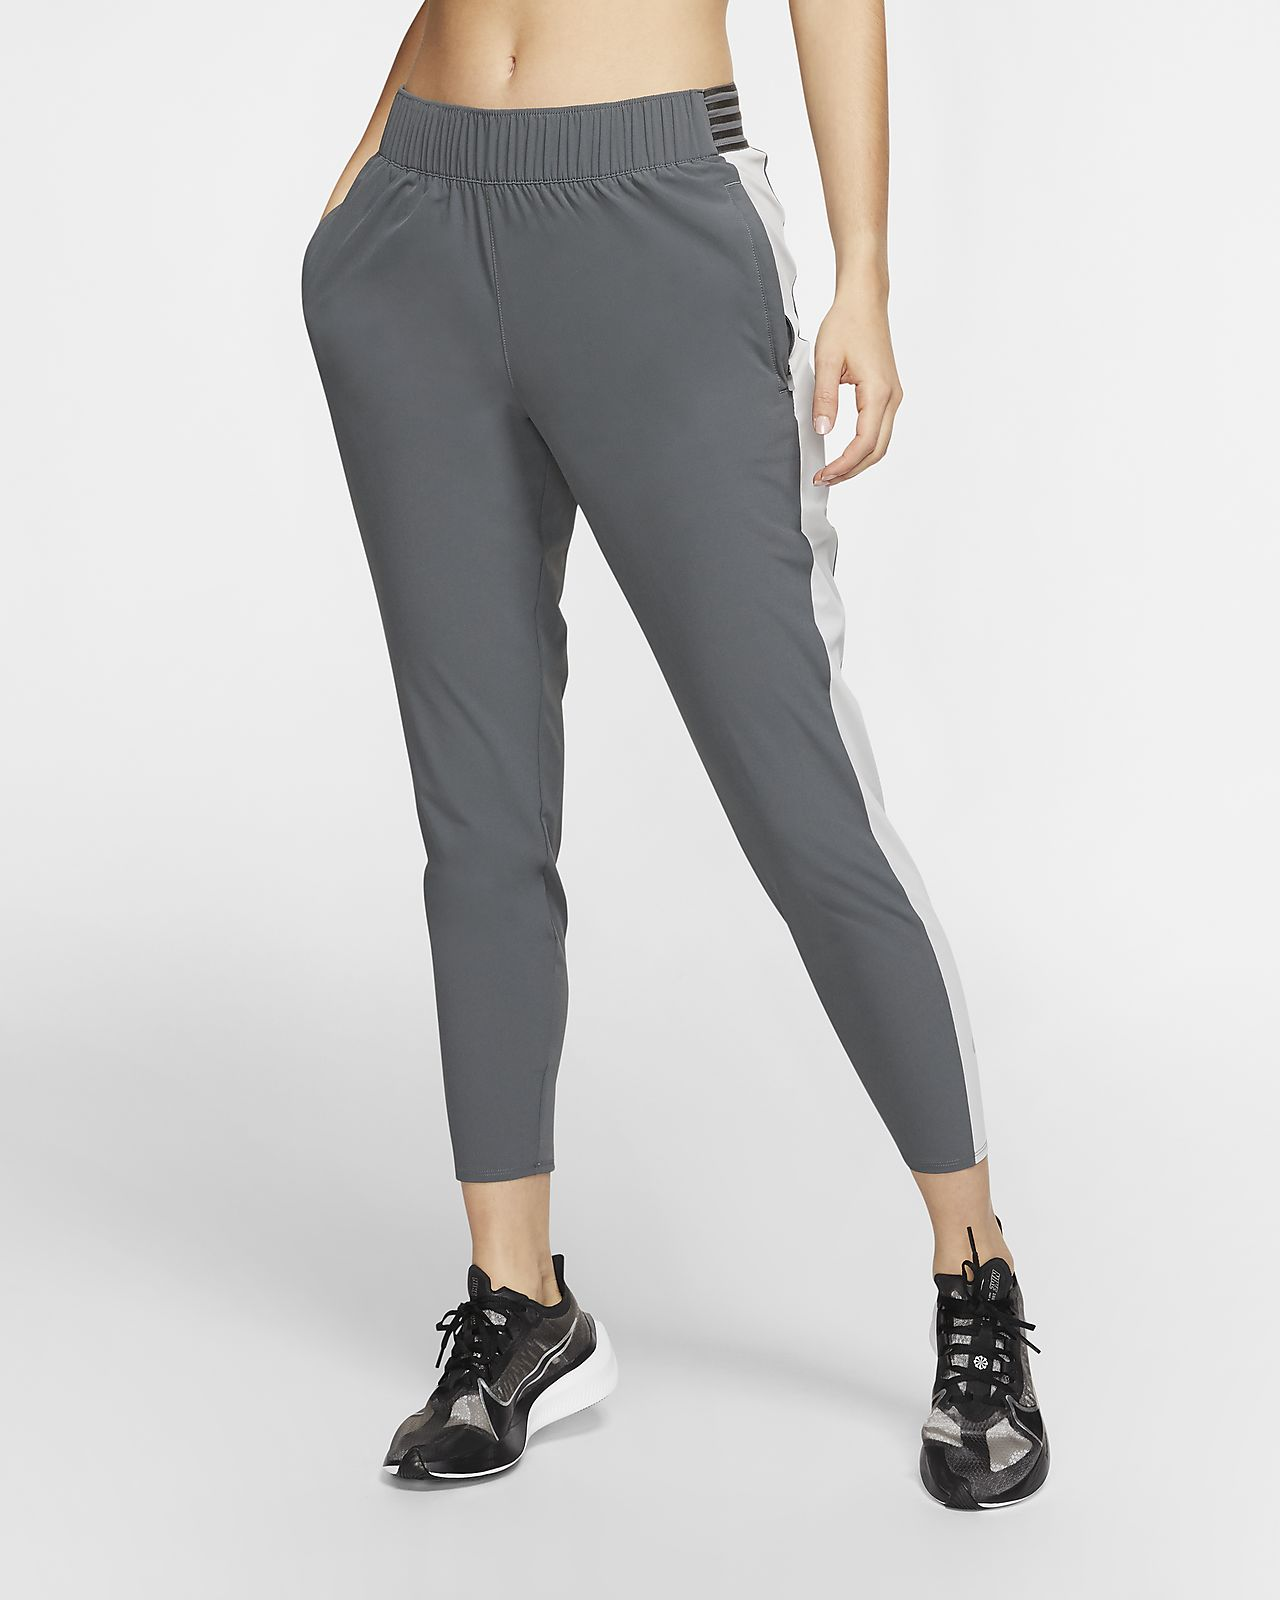 pantaloni donna nike running